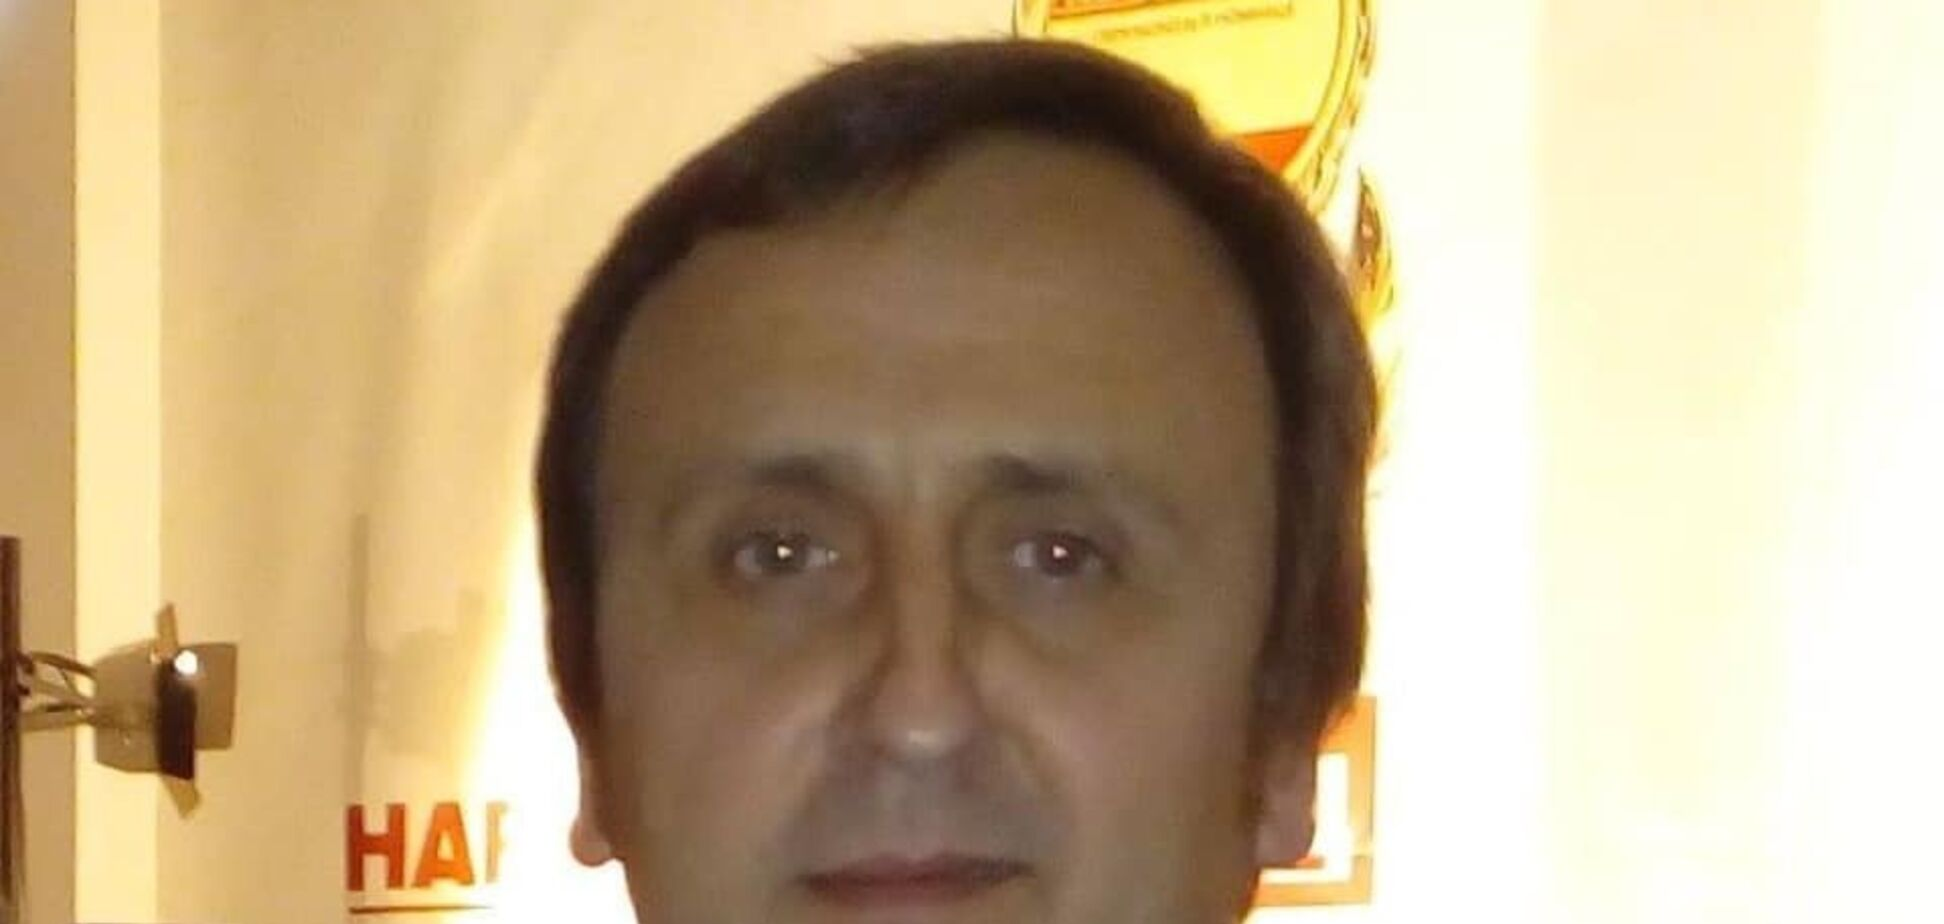 Стало известно о смерти жестоко избитого копами активиста Гриценко